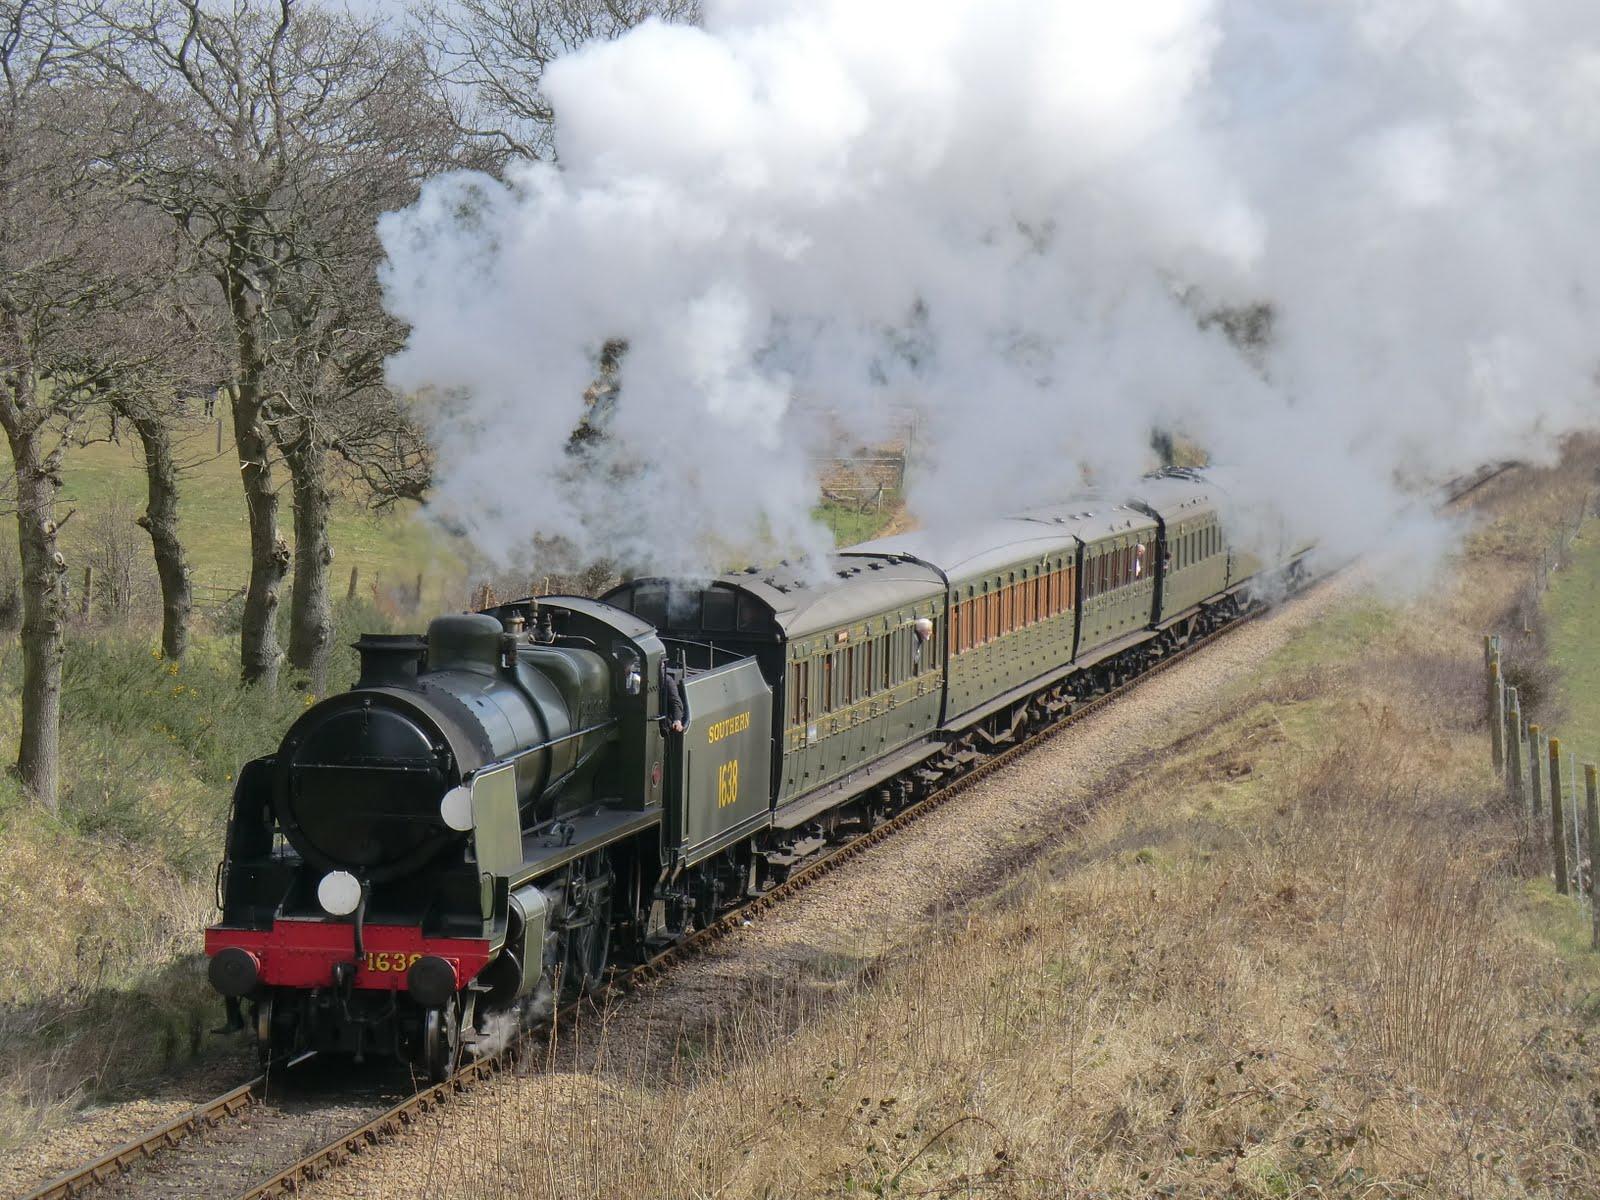 CIMG6172 A Bluebell Railway train chugs by